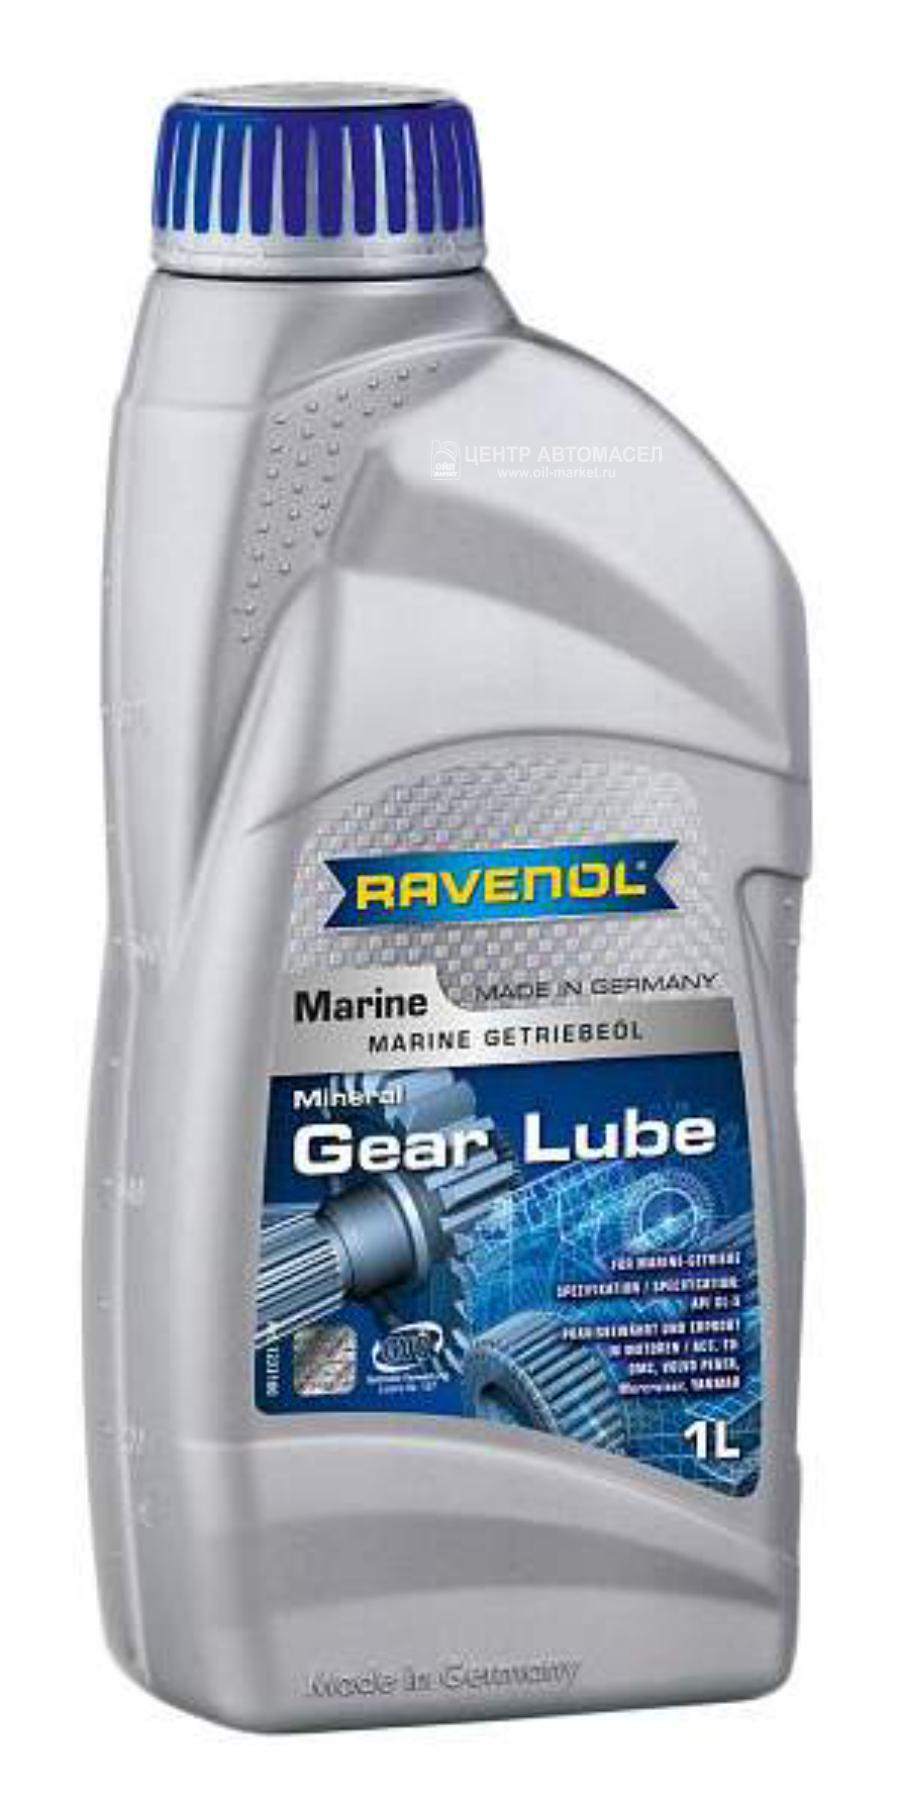 Трансмиссионное масло ravenol marine gear lube (1л) new